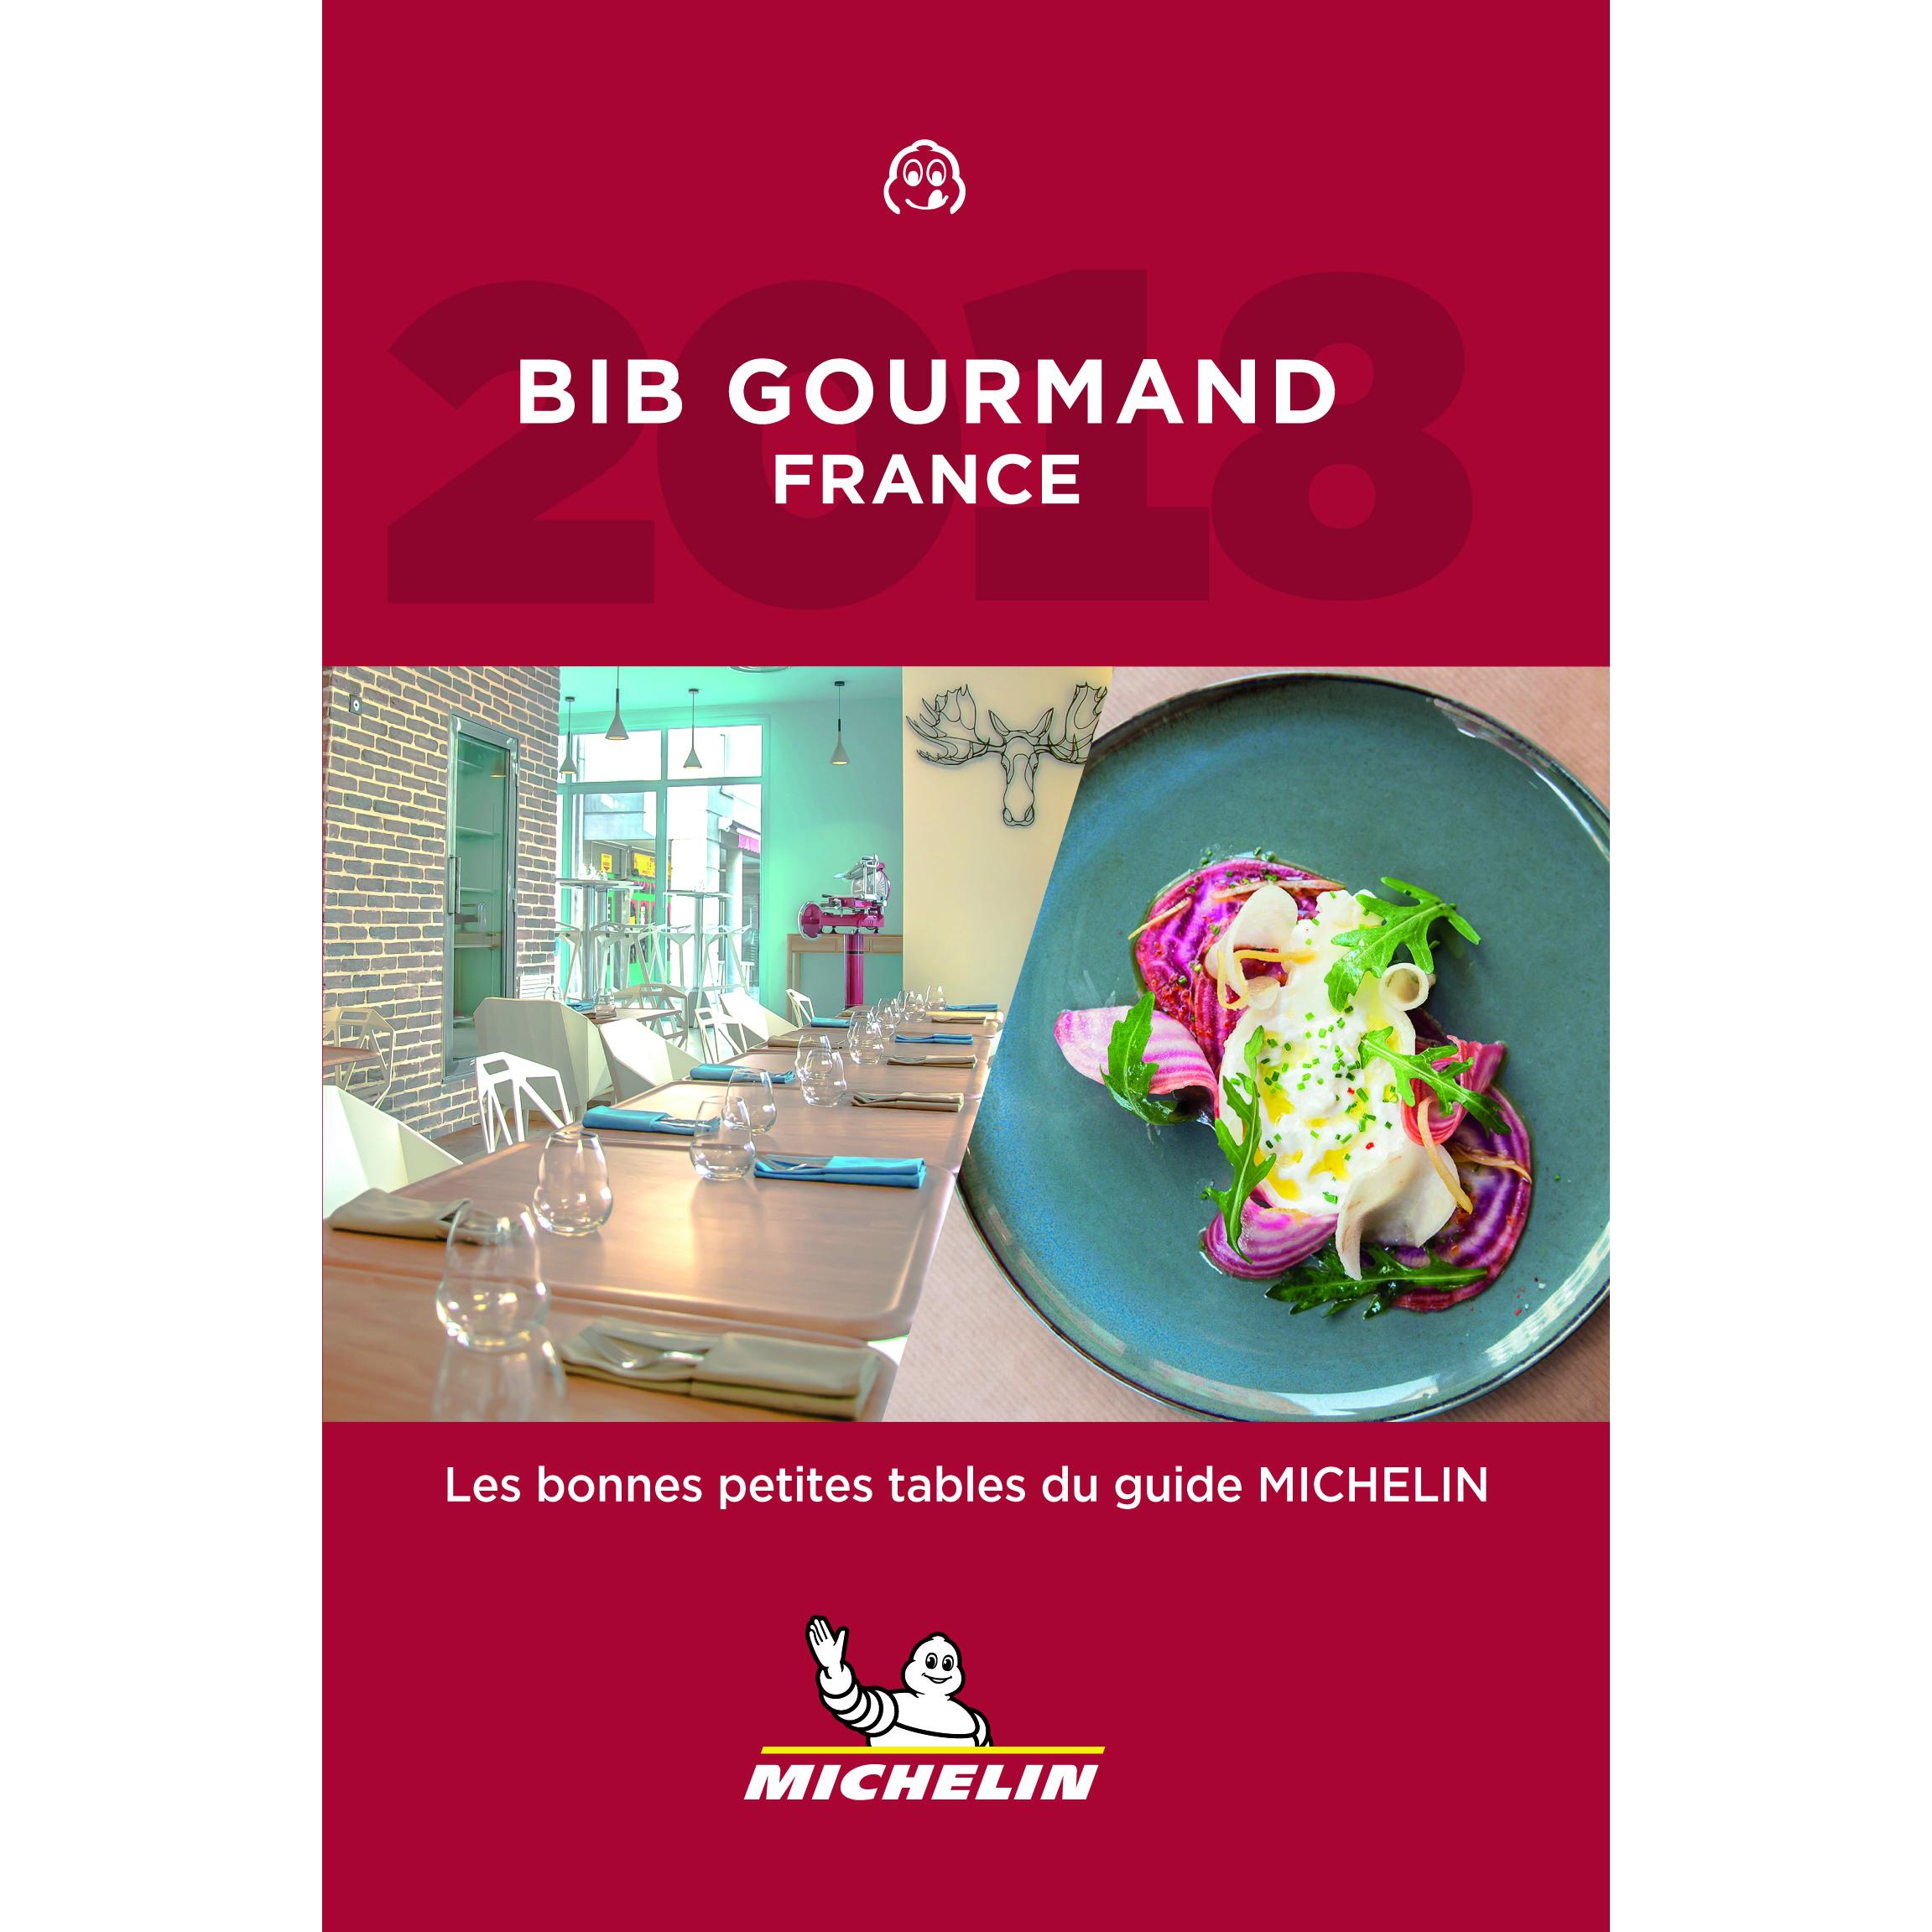 Fournews Michelin Announces Bib Gourmand List For France